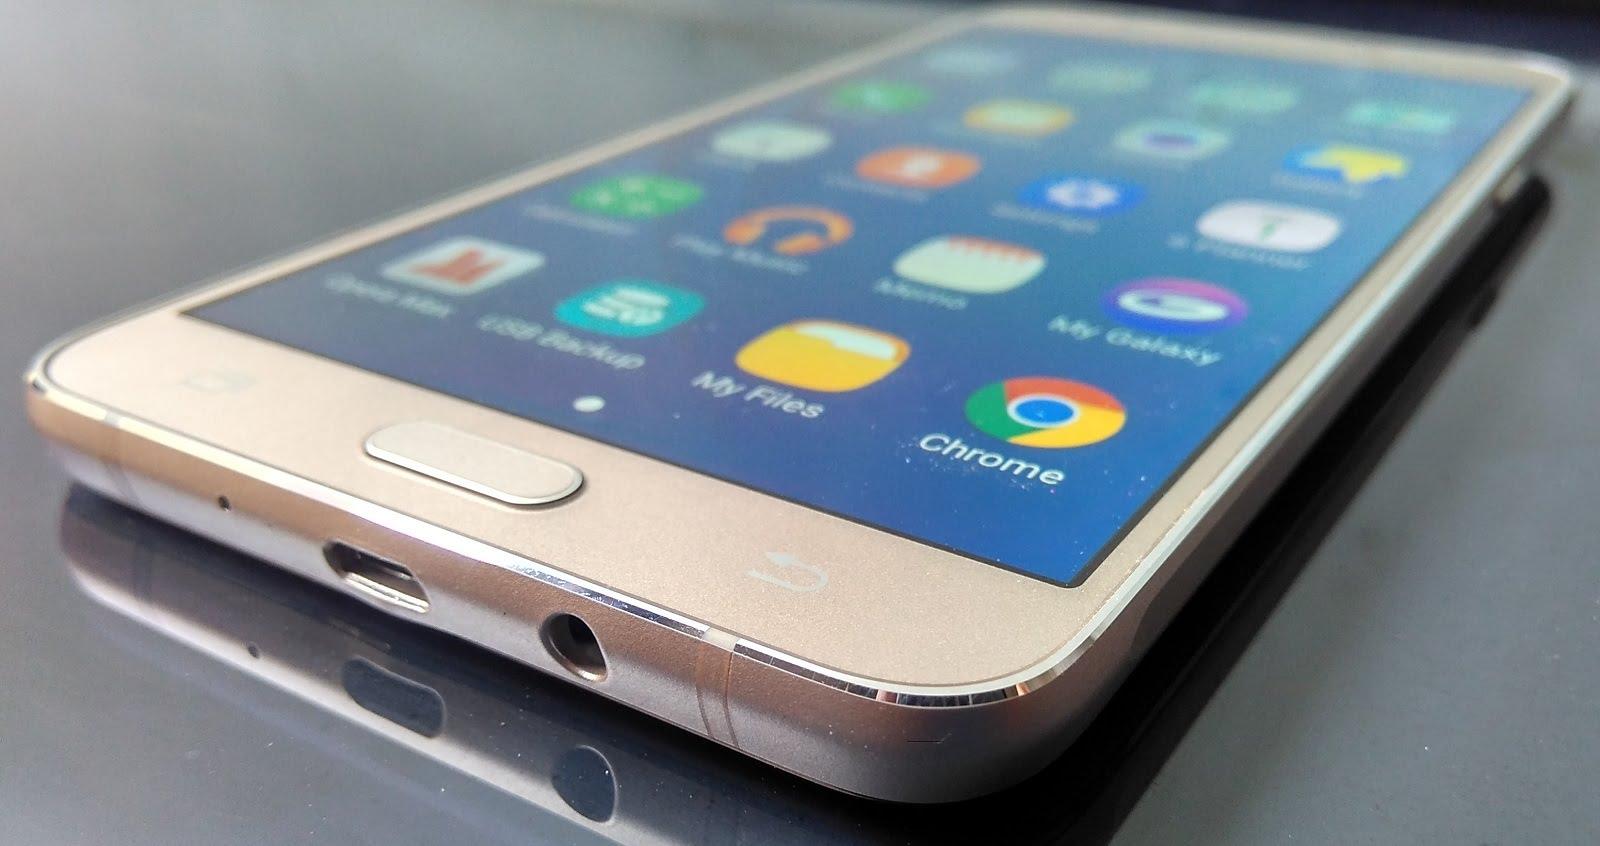 Geekbench otestoval Galaxy J7 (2017) od Samsungu